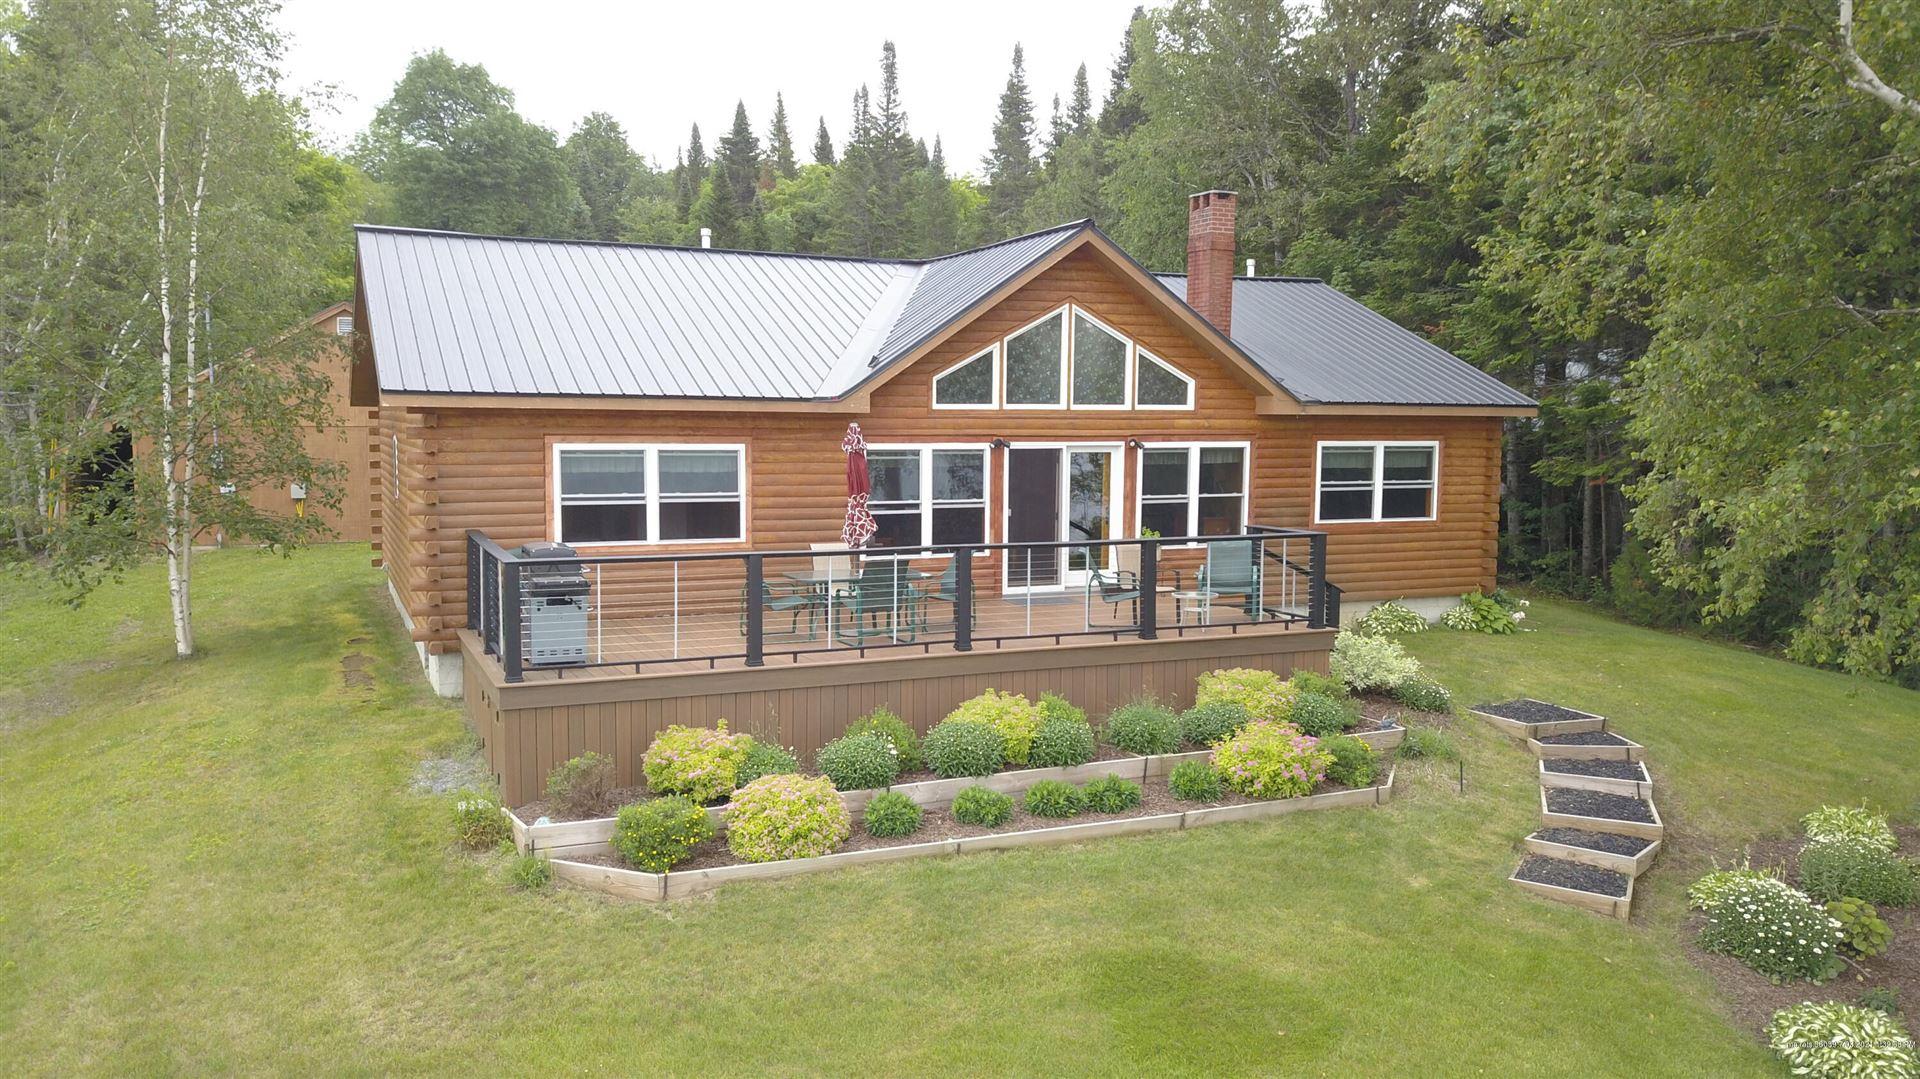 Photo of 503 Cottage Road, Portage Lake, ME 04768 (MLS # 1499063)